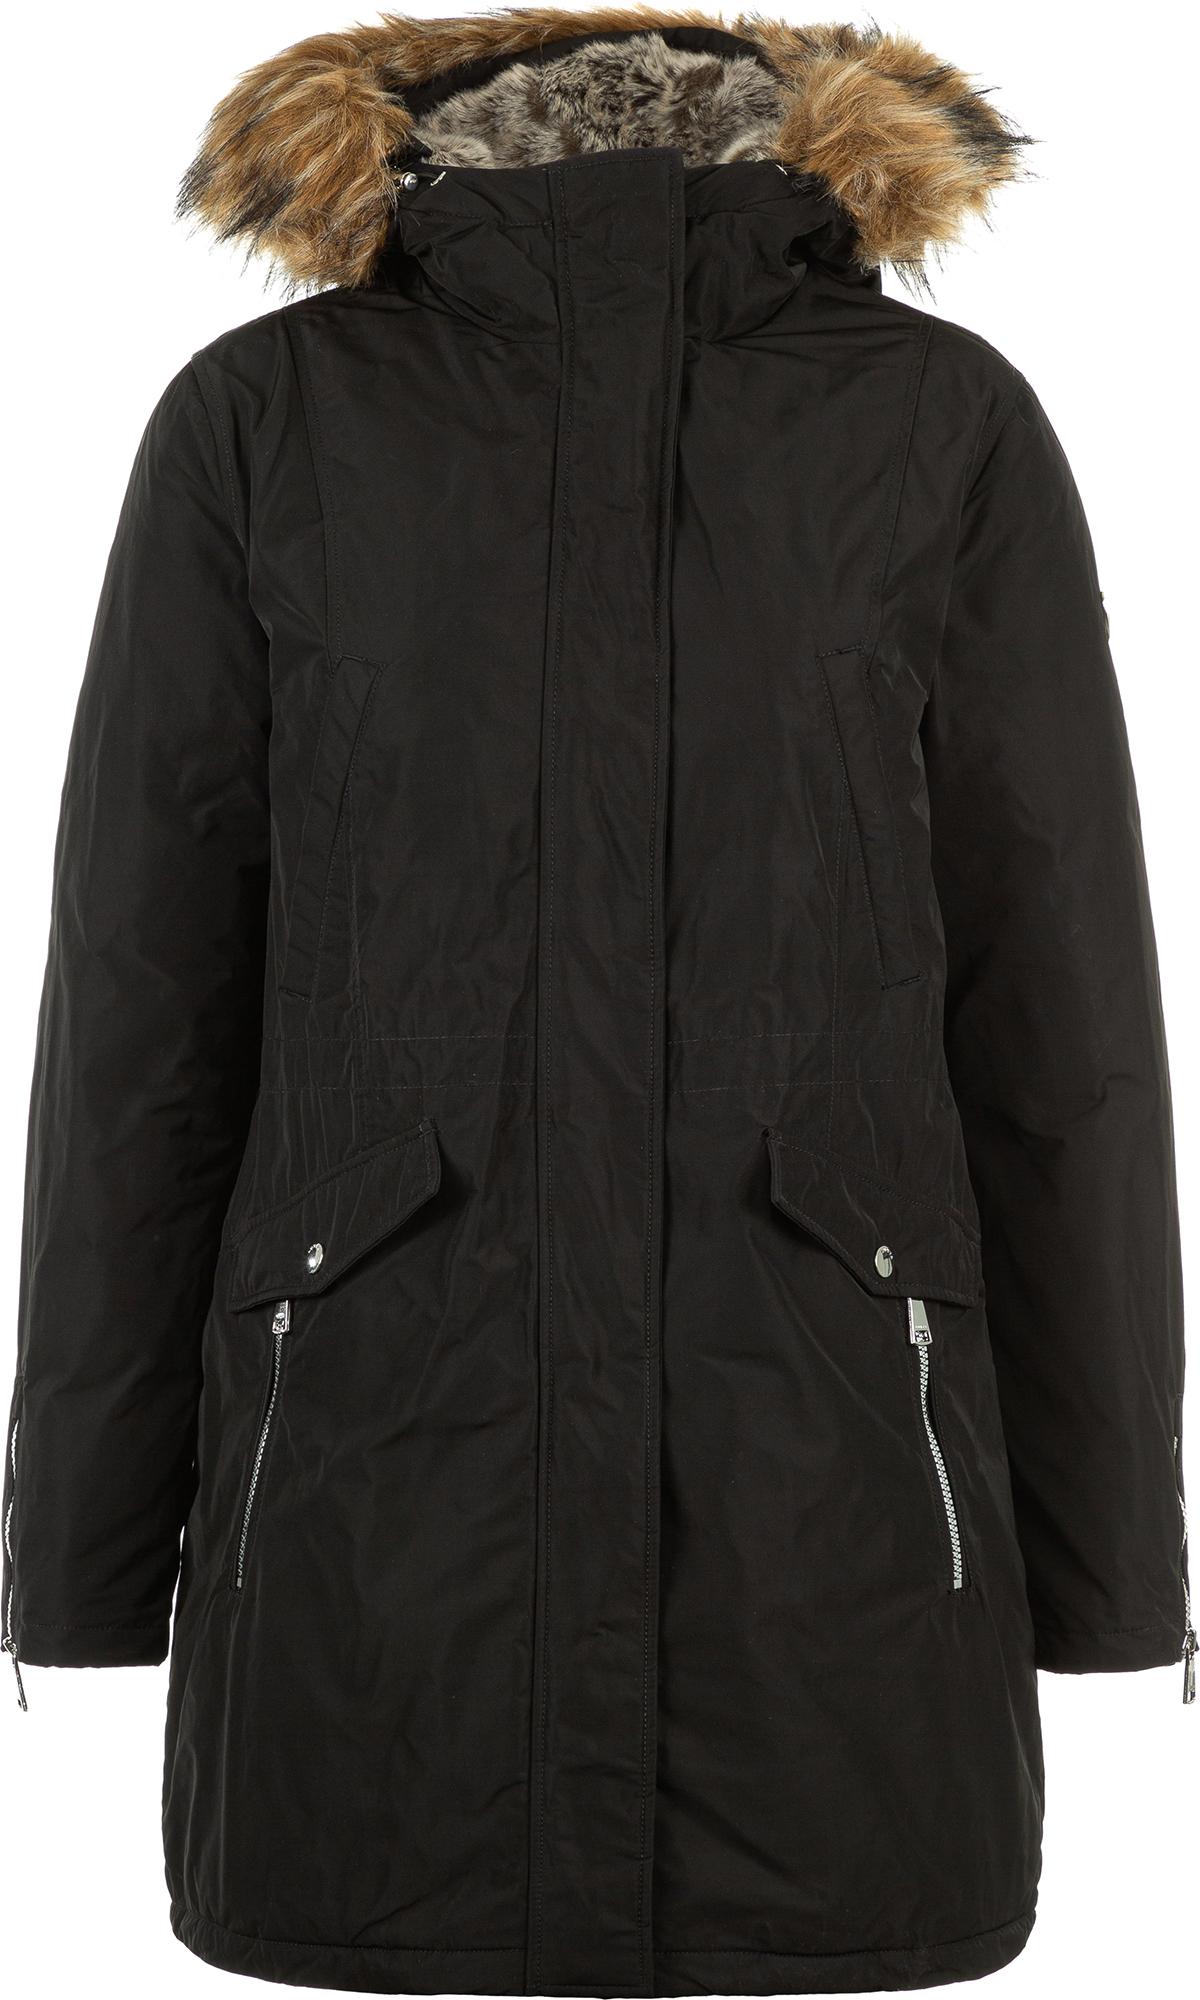 Luhta Куртка утепленная женская Luhta Ilomantsi, размер 44 luhta куртка утепленная женская luhta petre размер 52